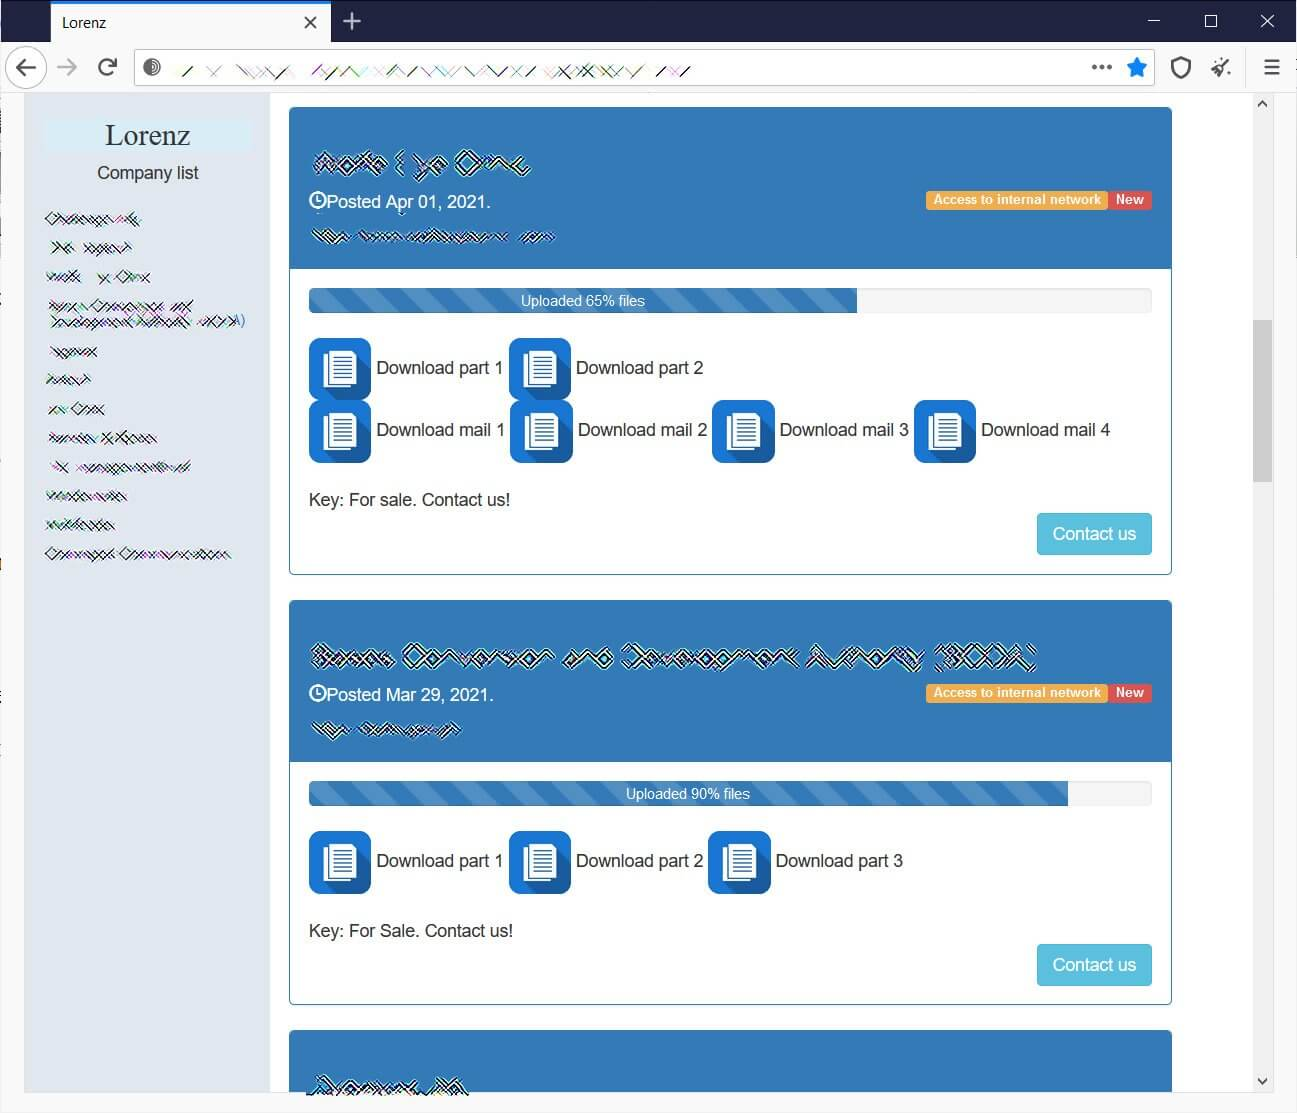 Lorenz ransomware data leak site